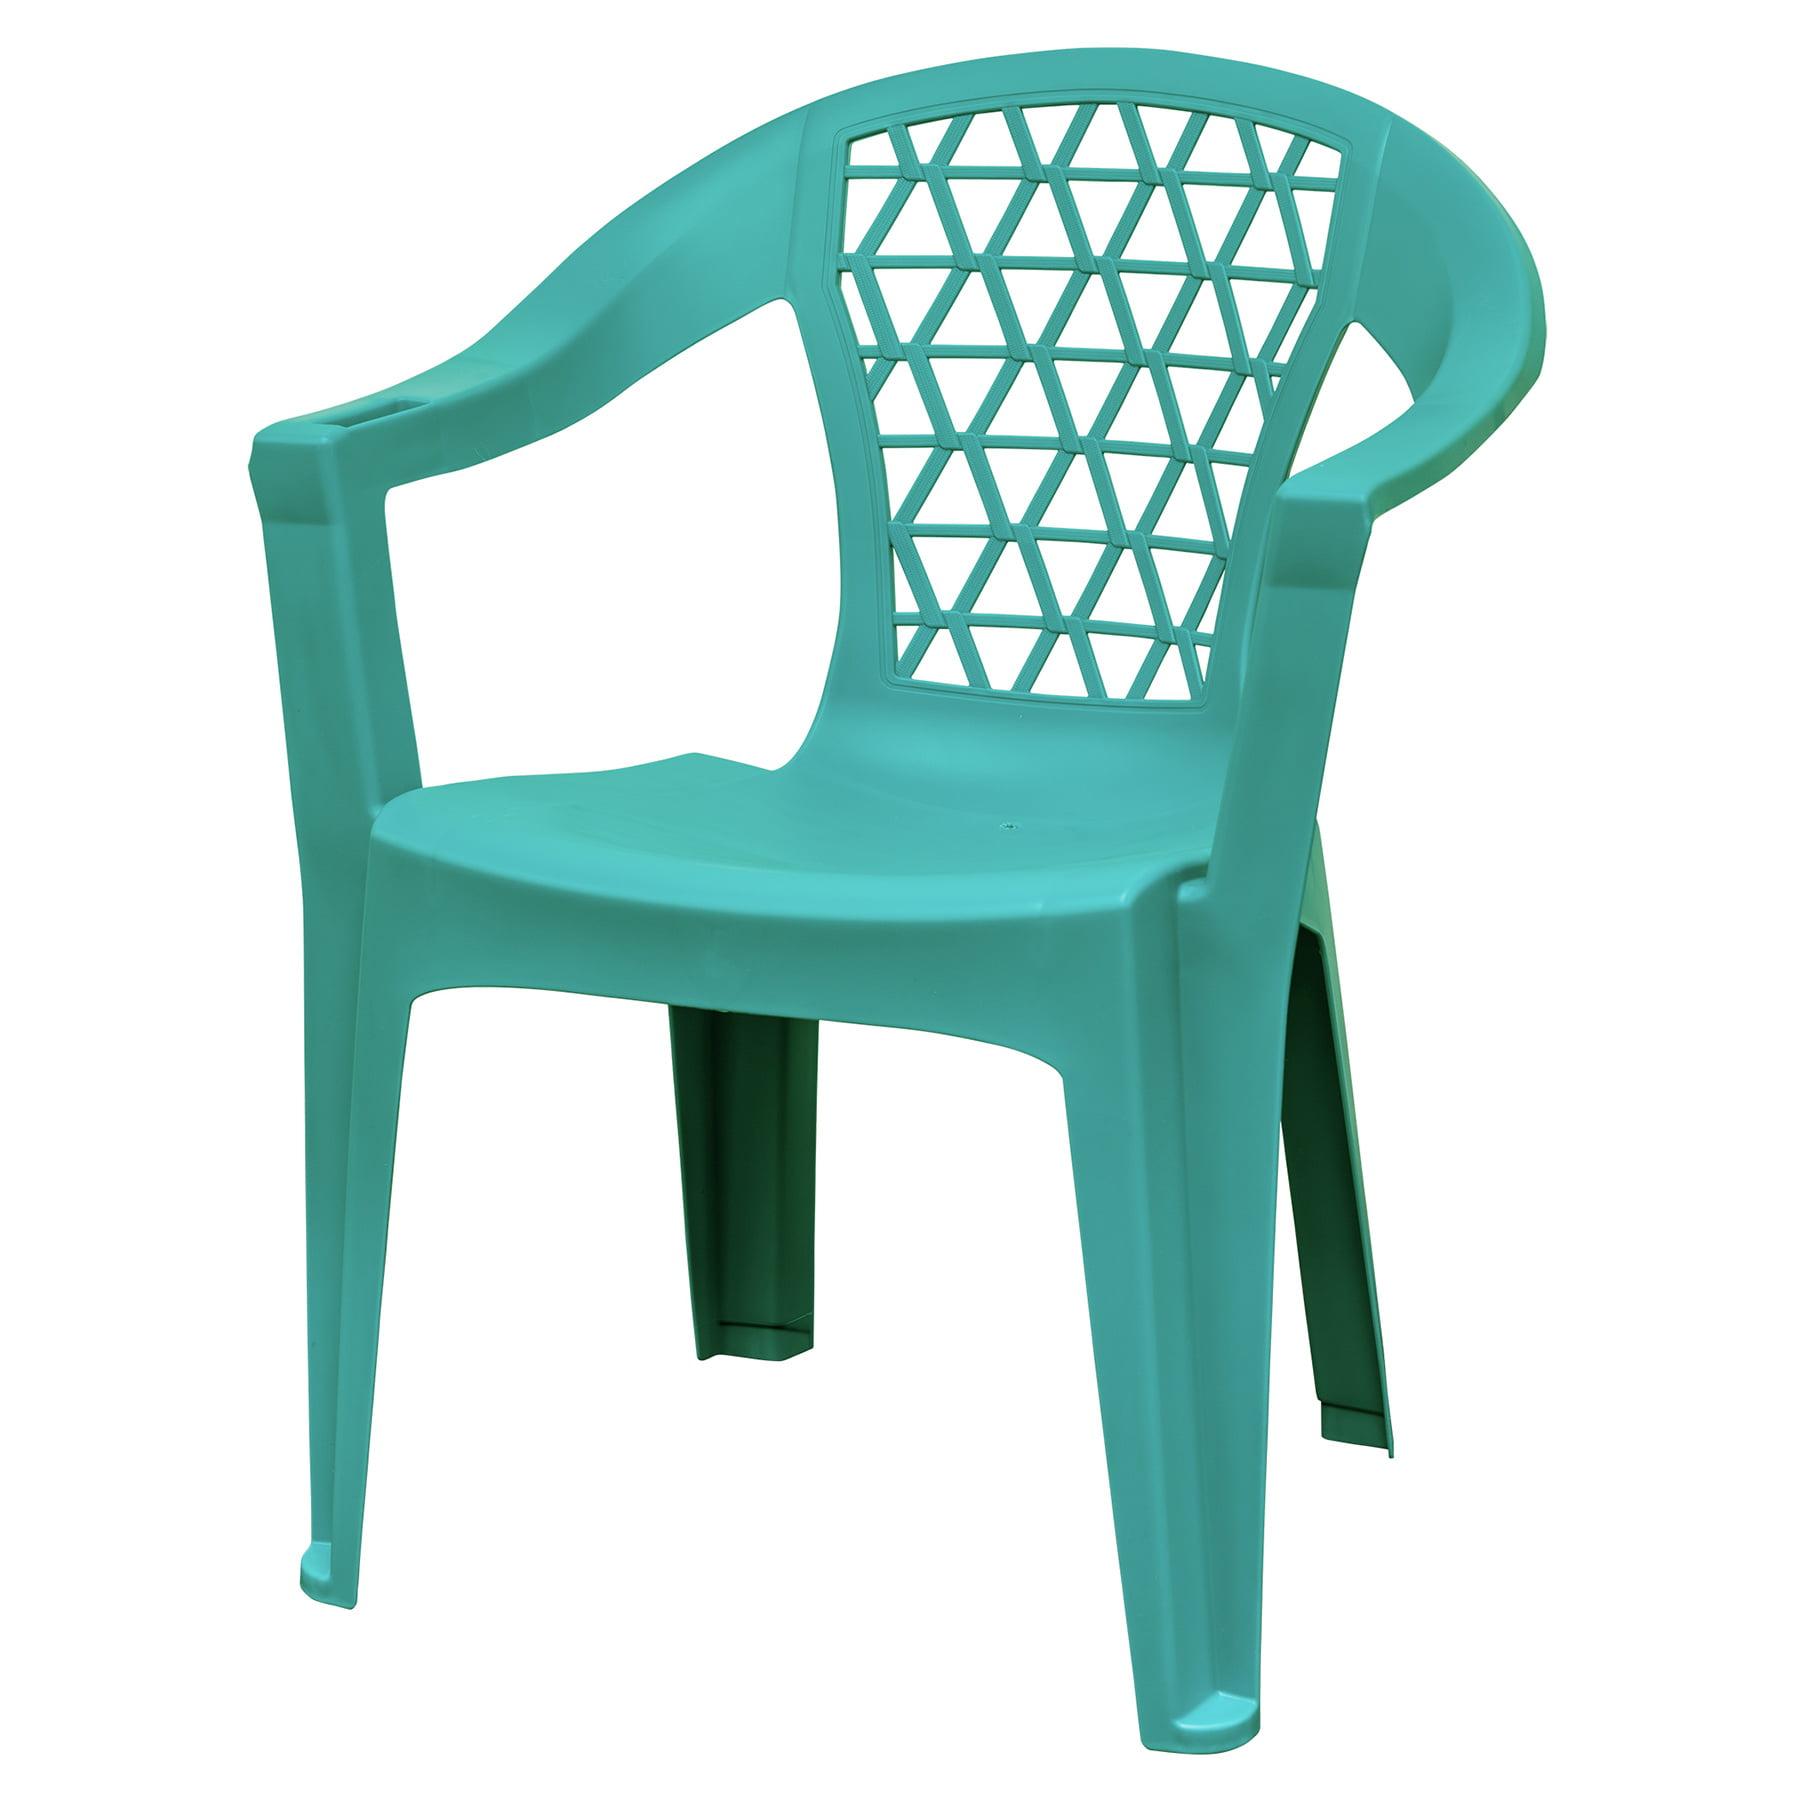 Adams Penza Outdoor Resin Stack Chair With Phone Holder Plastic Patio Furniture Teal Walmart Com Walmart Com